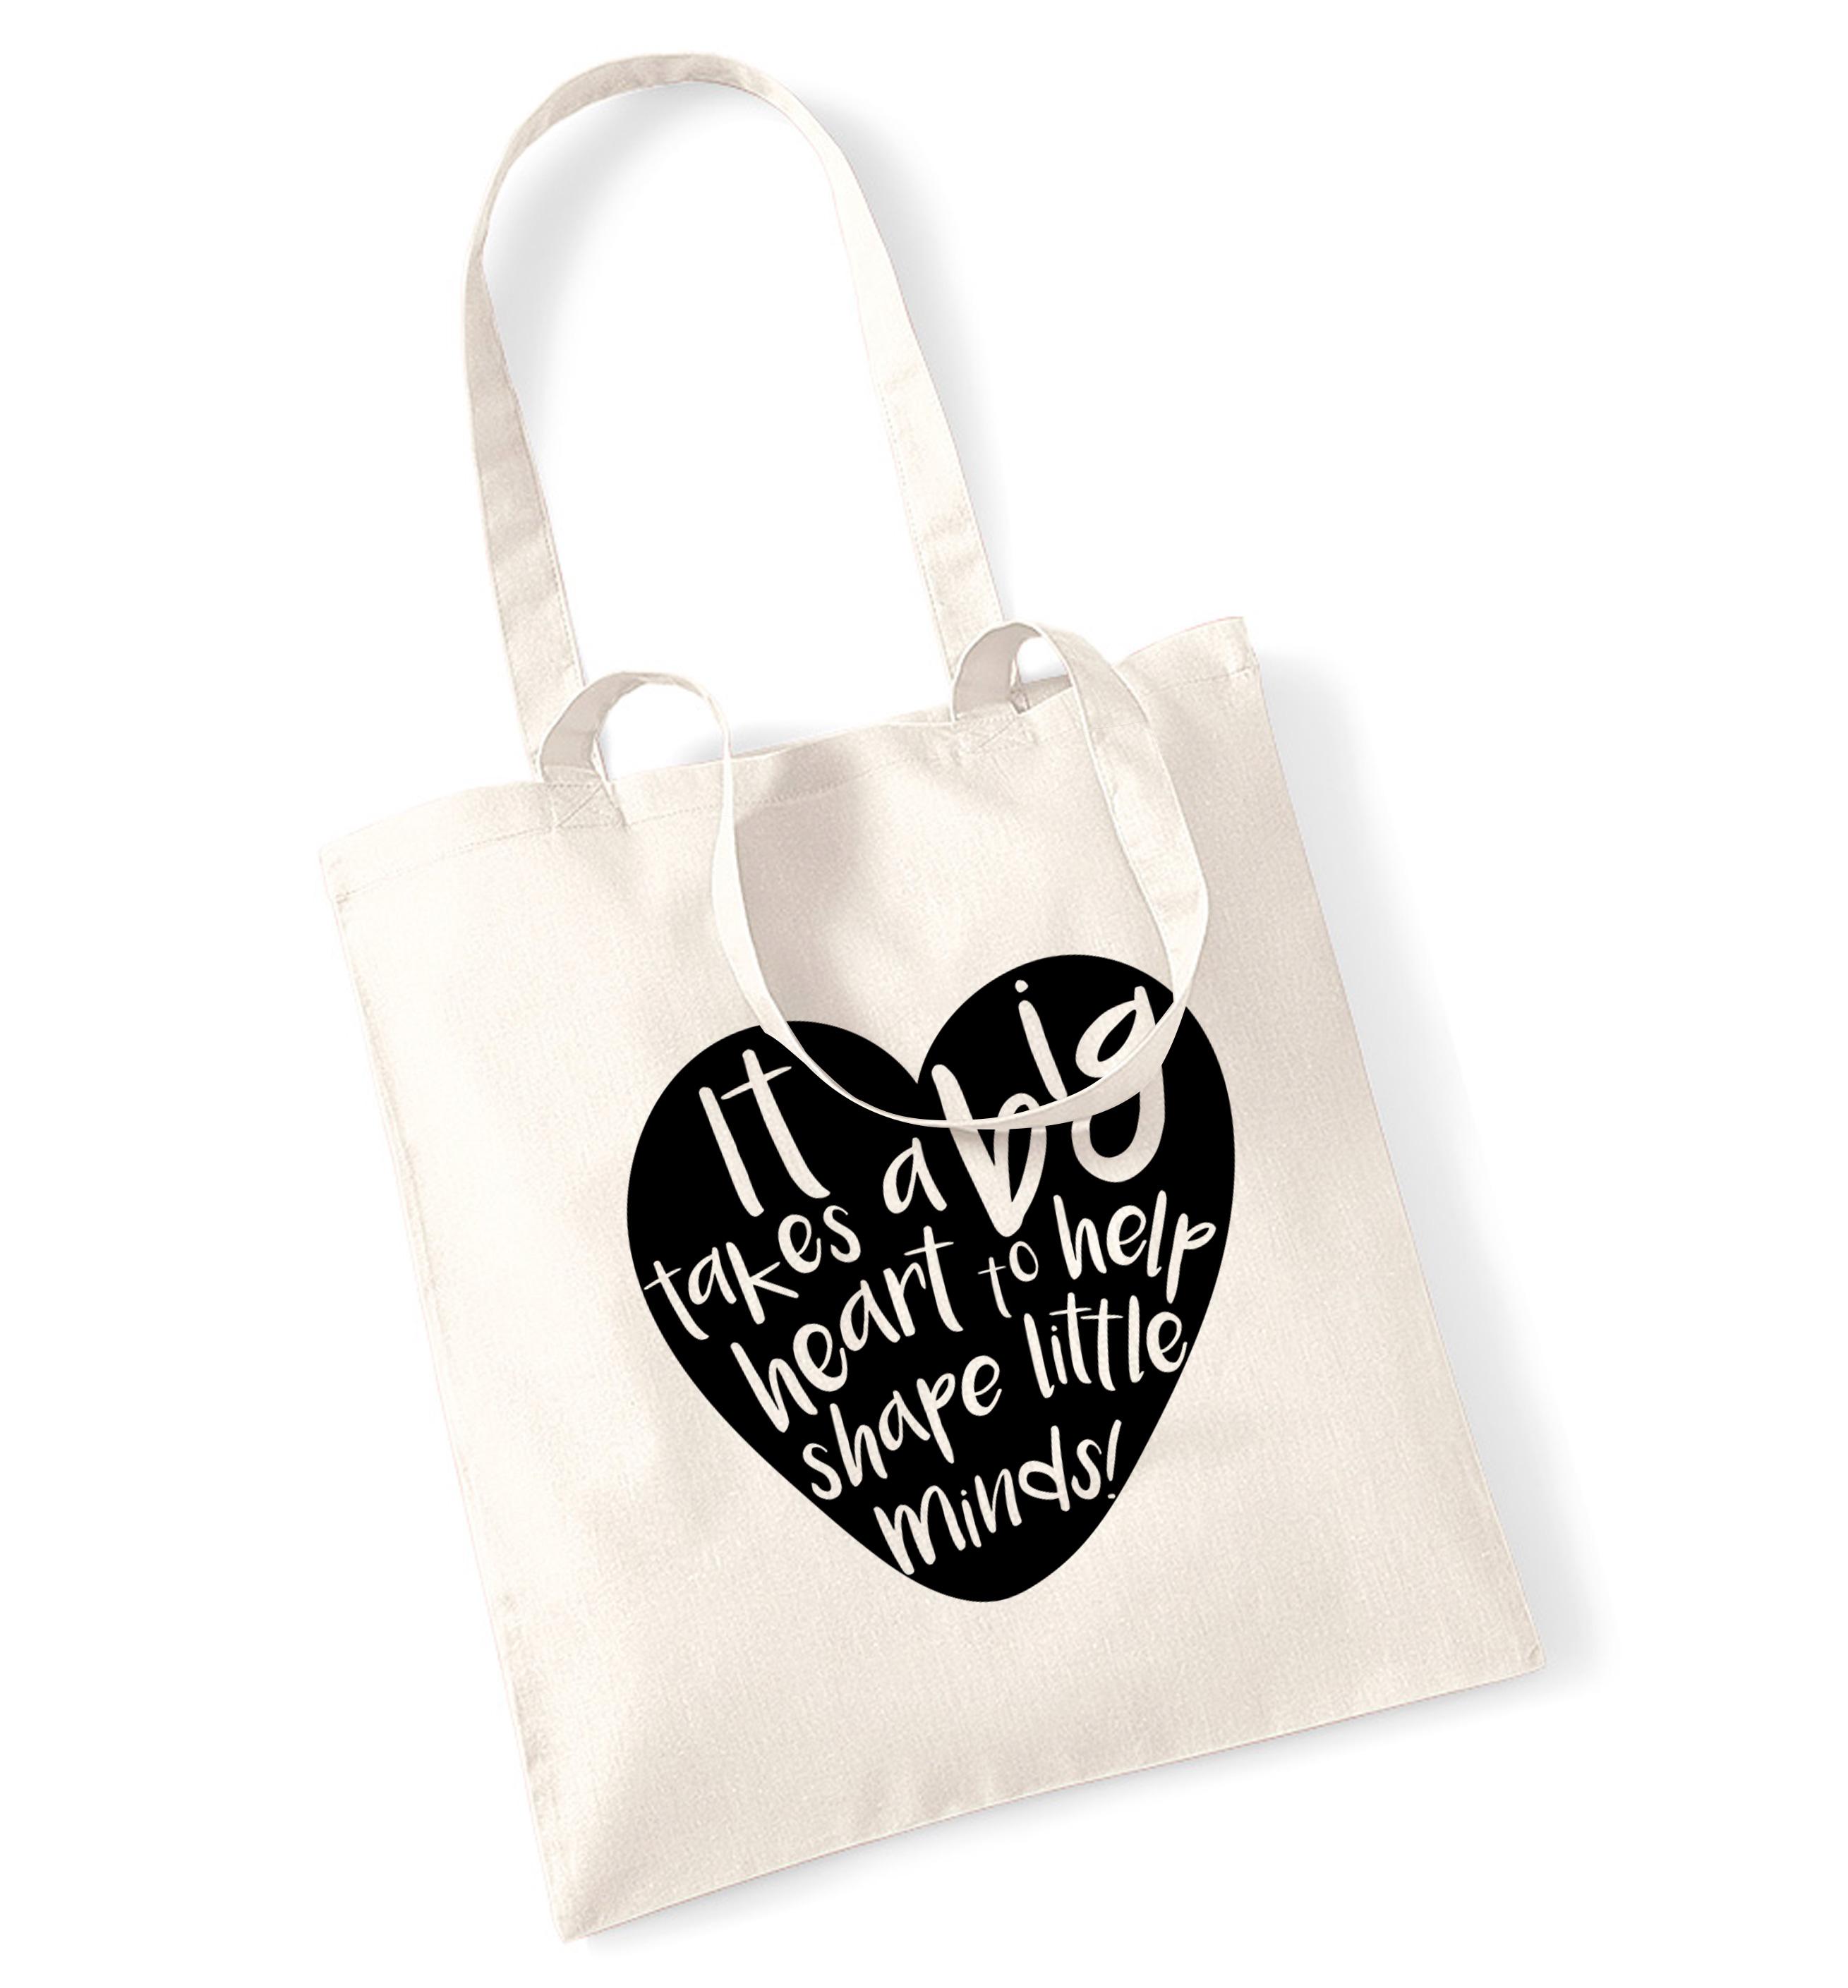 Bags for school teachers - Tote Bag Teacher 155_20tote_original